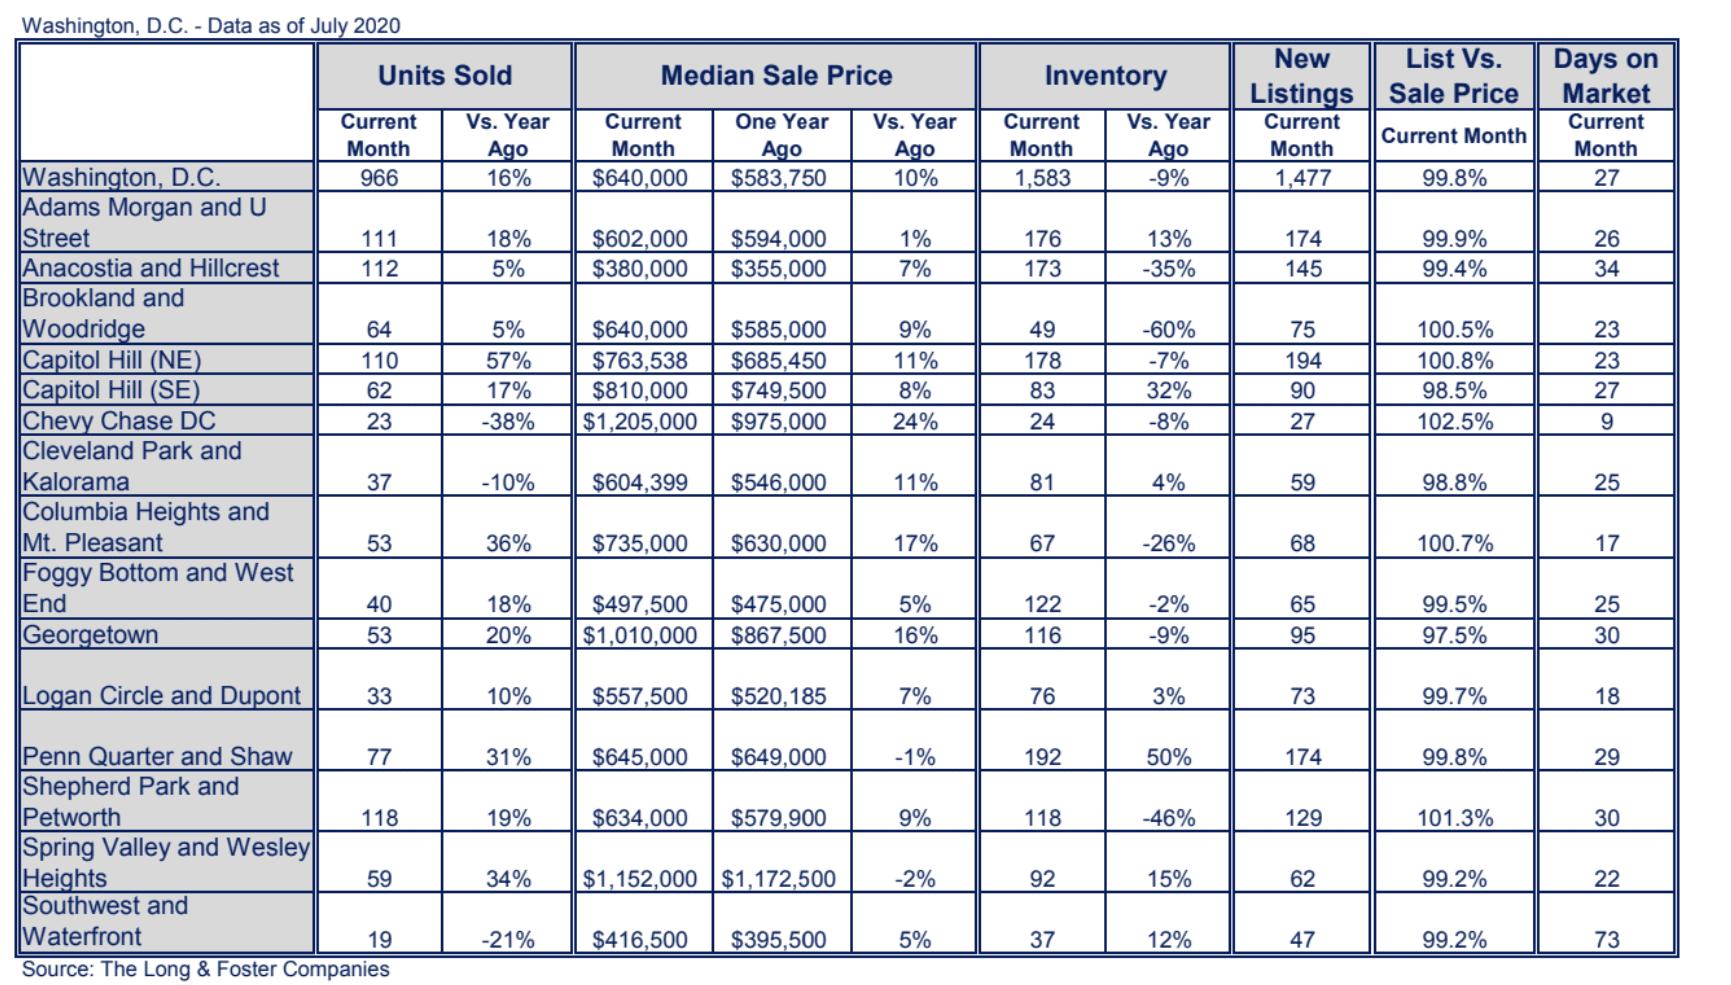 Washington, D.C. Market Minute Chart July 2020